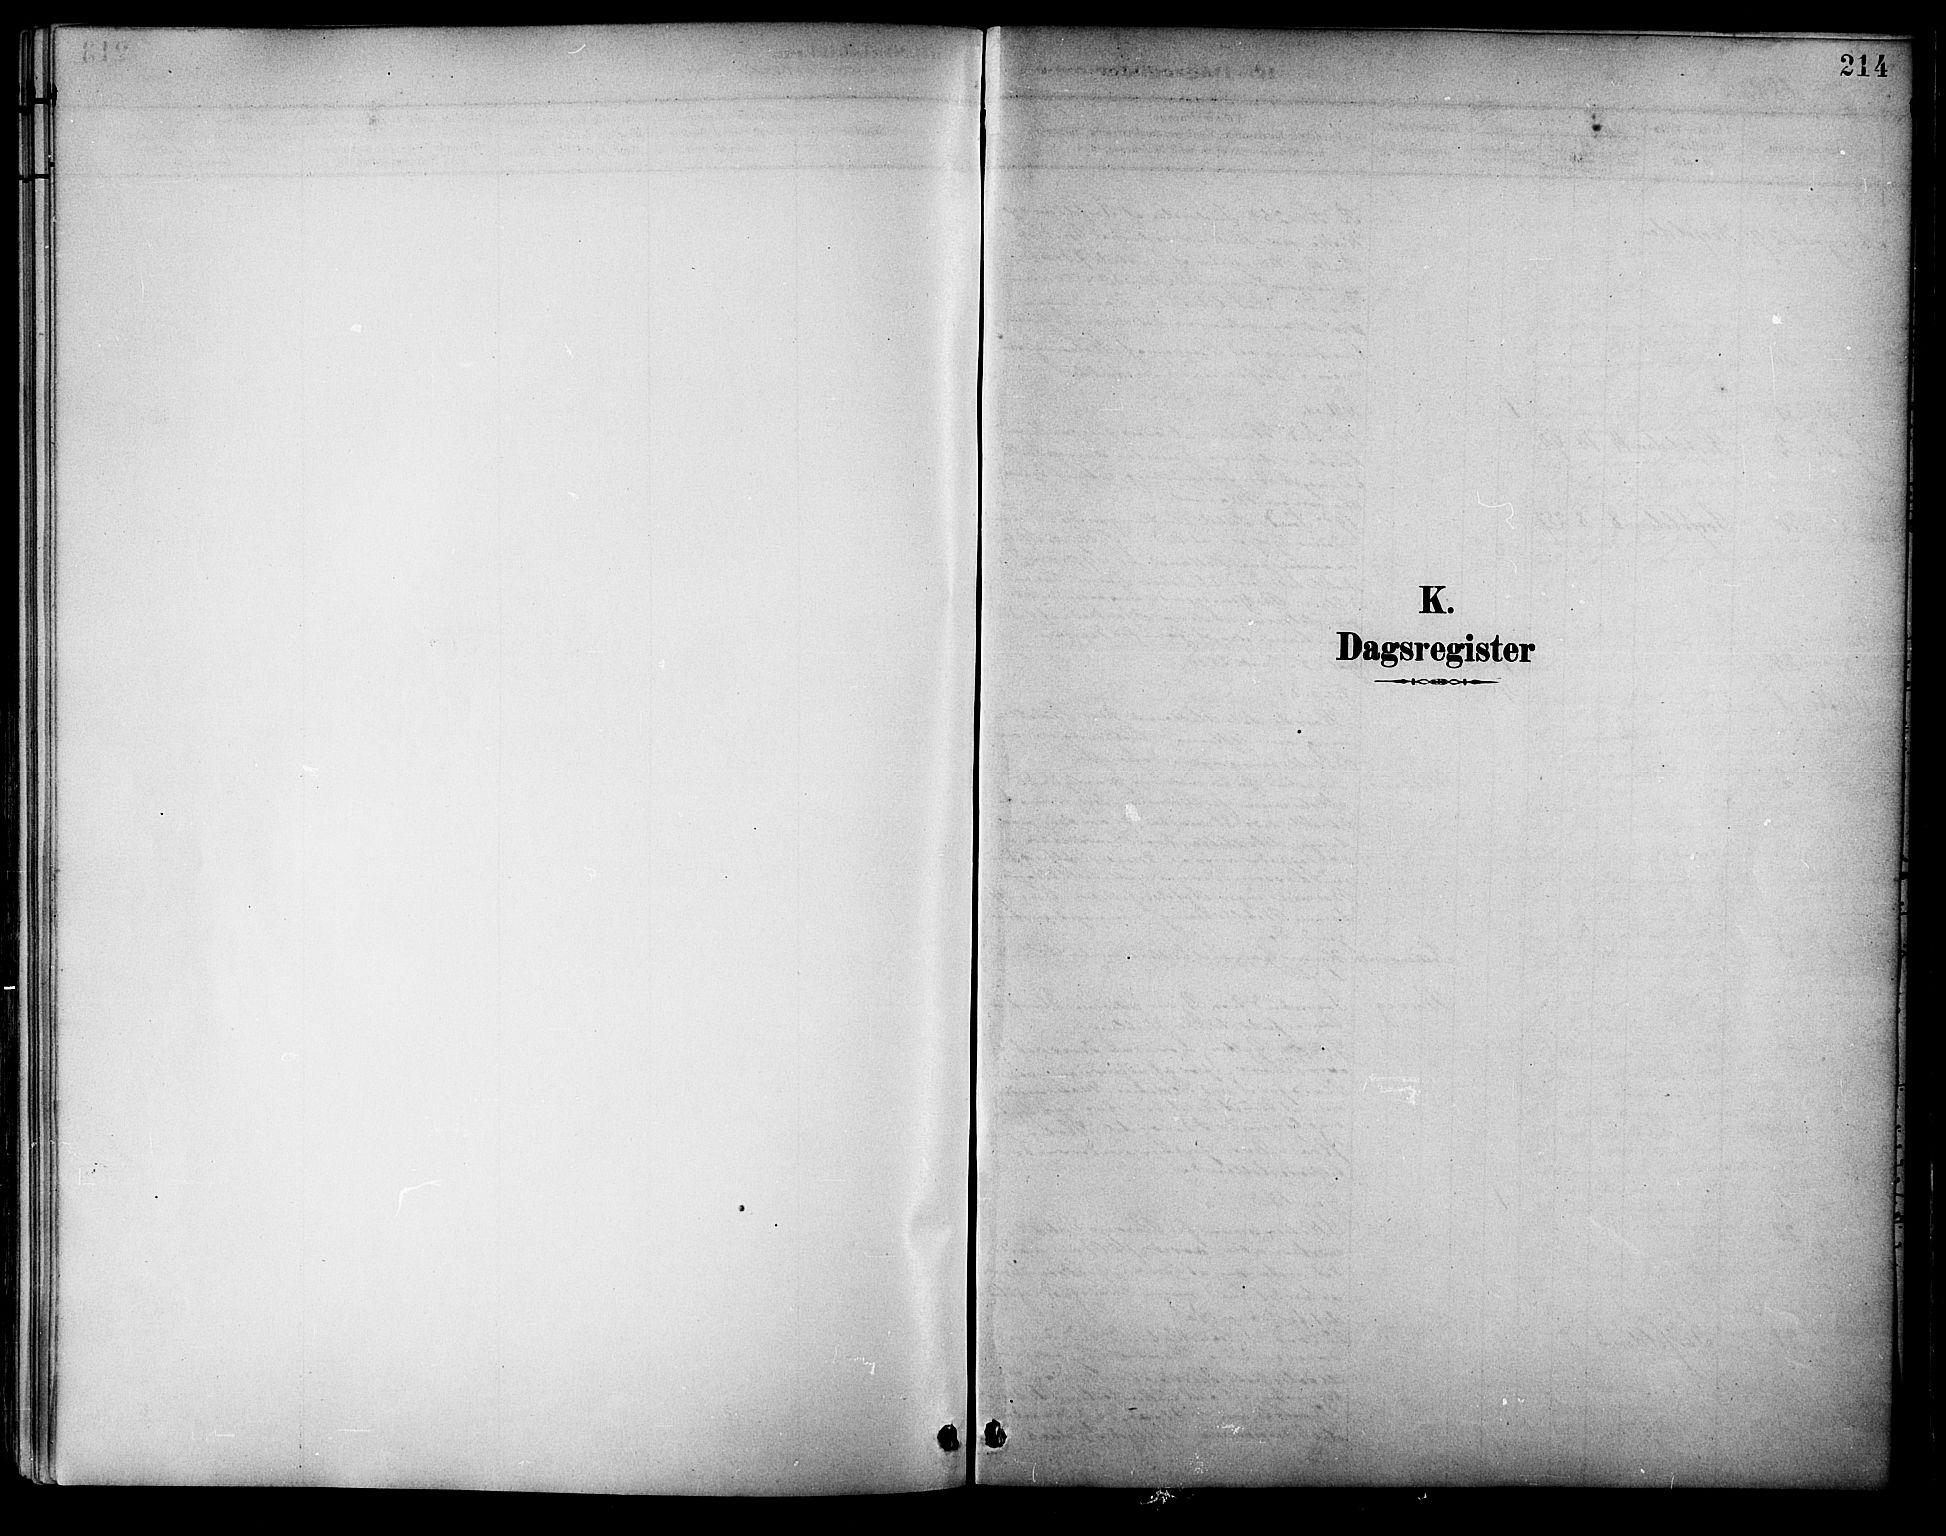 SAT, Ministerialprotokoller, klokkerbøker og fødselsregistre - Nordland, 854/L0777: Ministerialbok nr. 854A01 /1, 1883-1891, s. 214